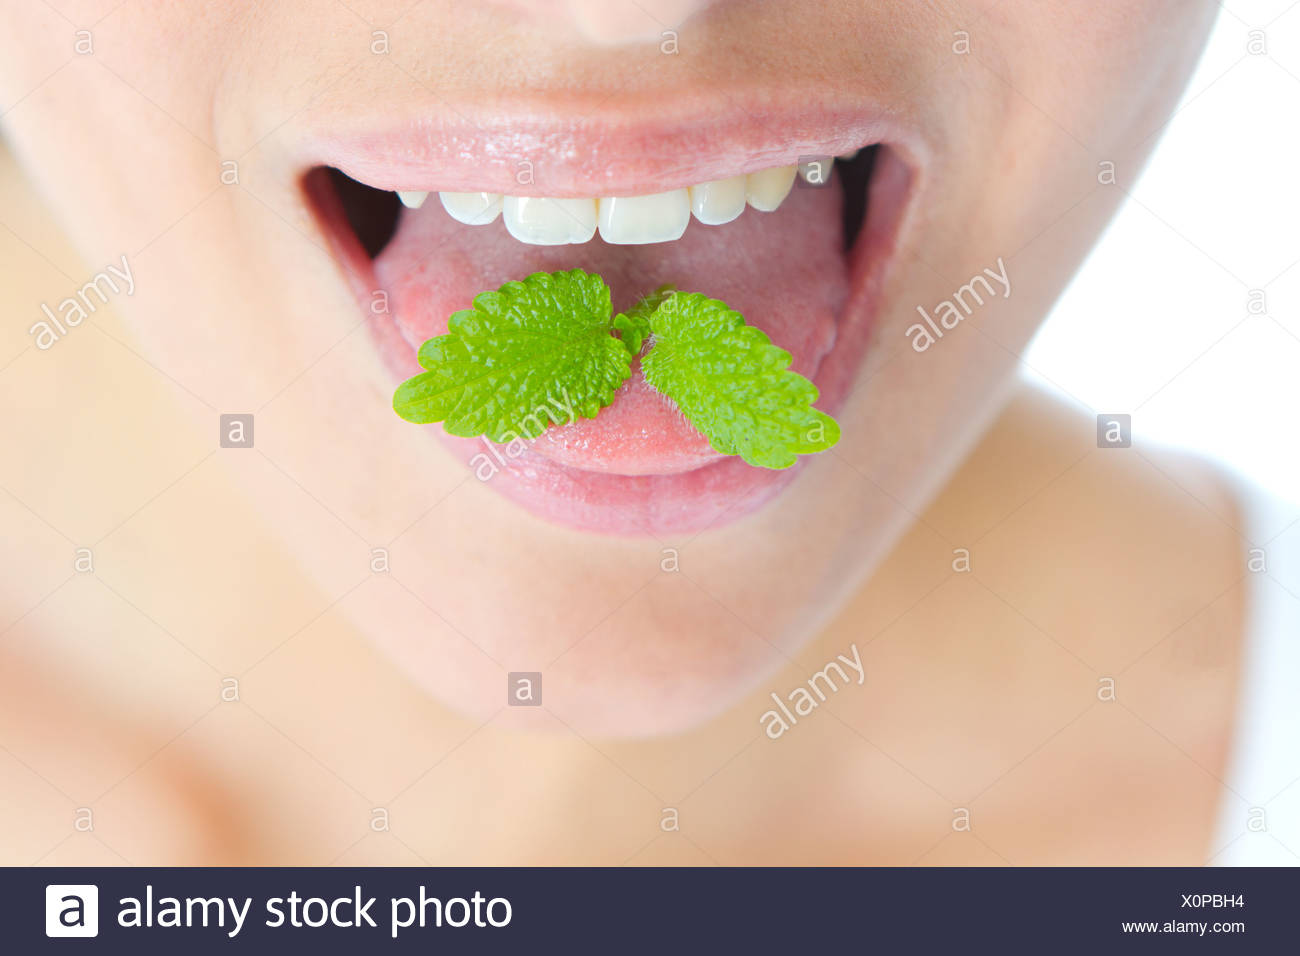 Mint on Tongue - Stock Image